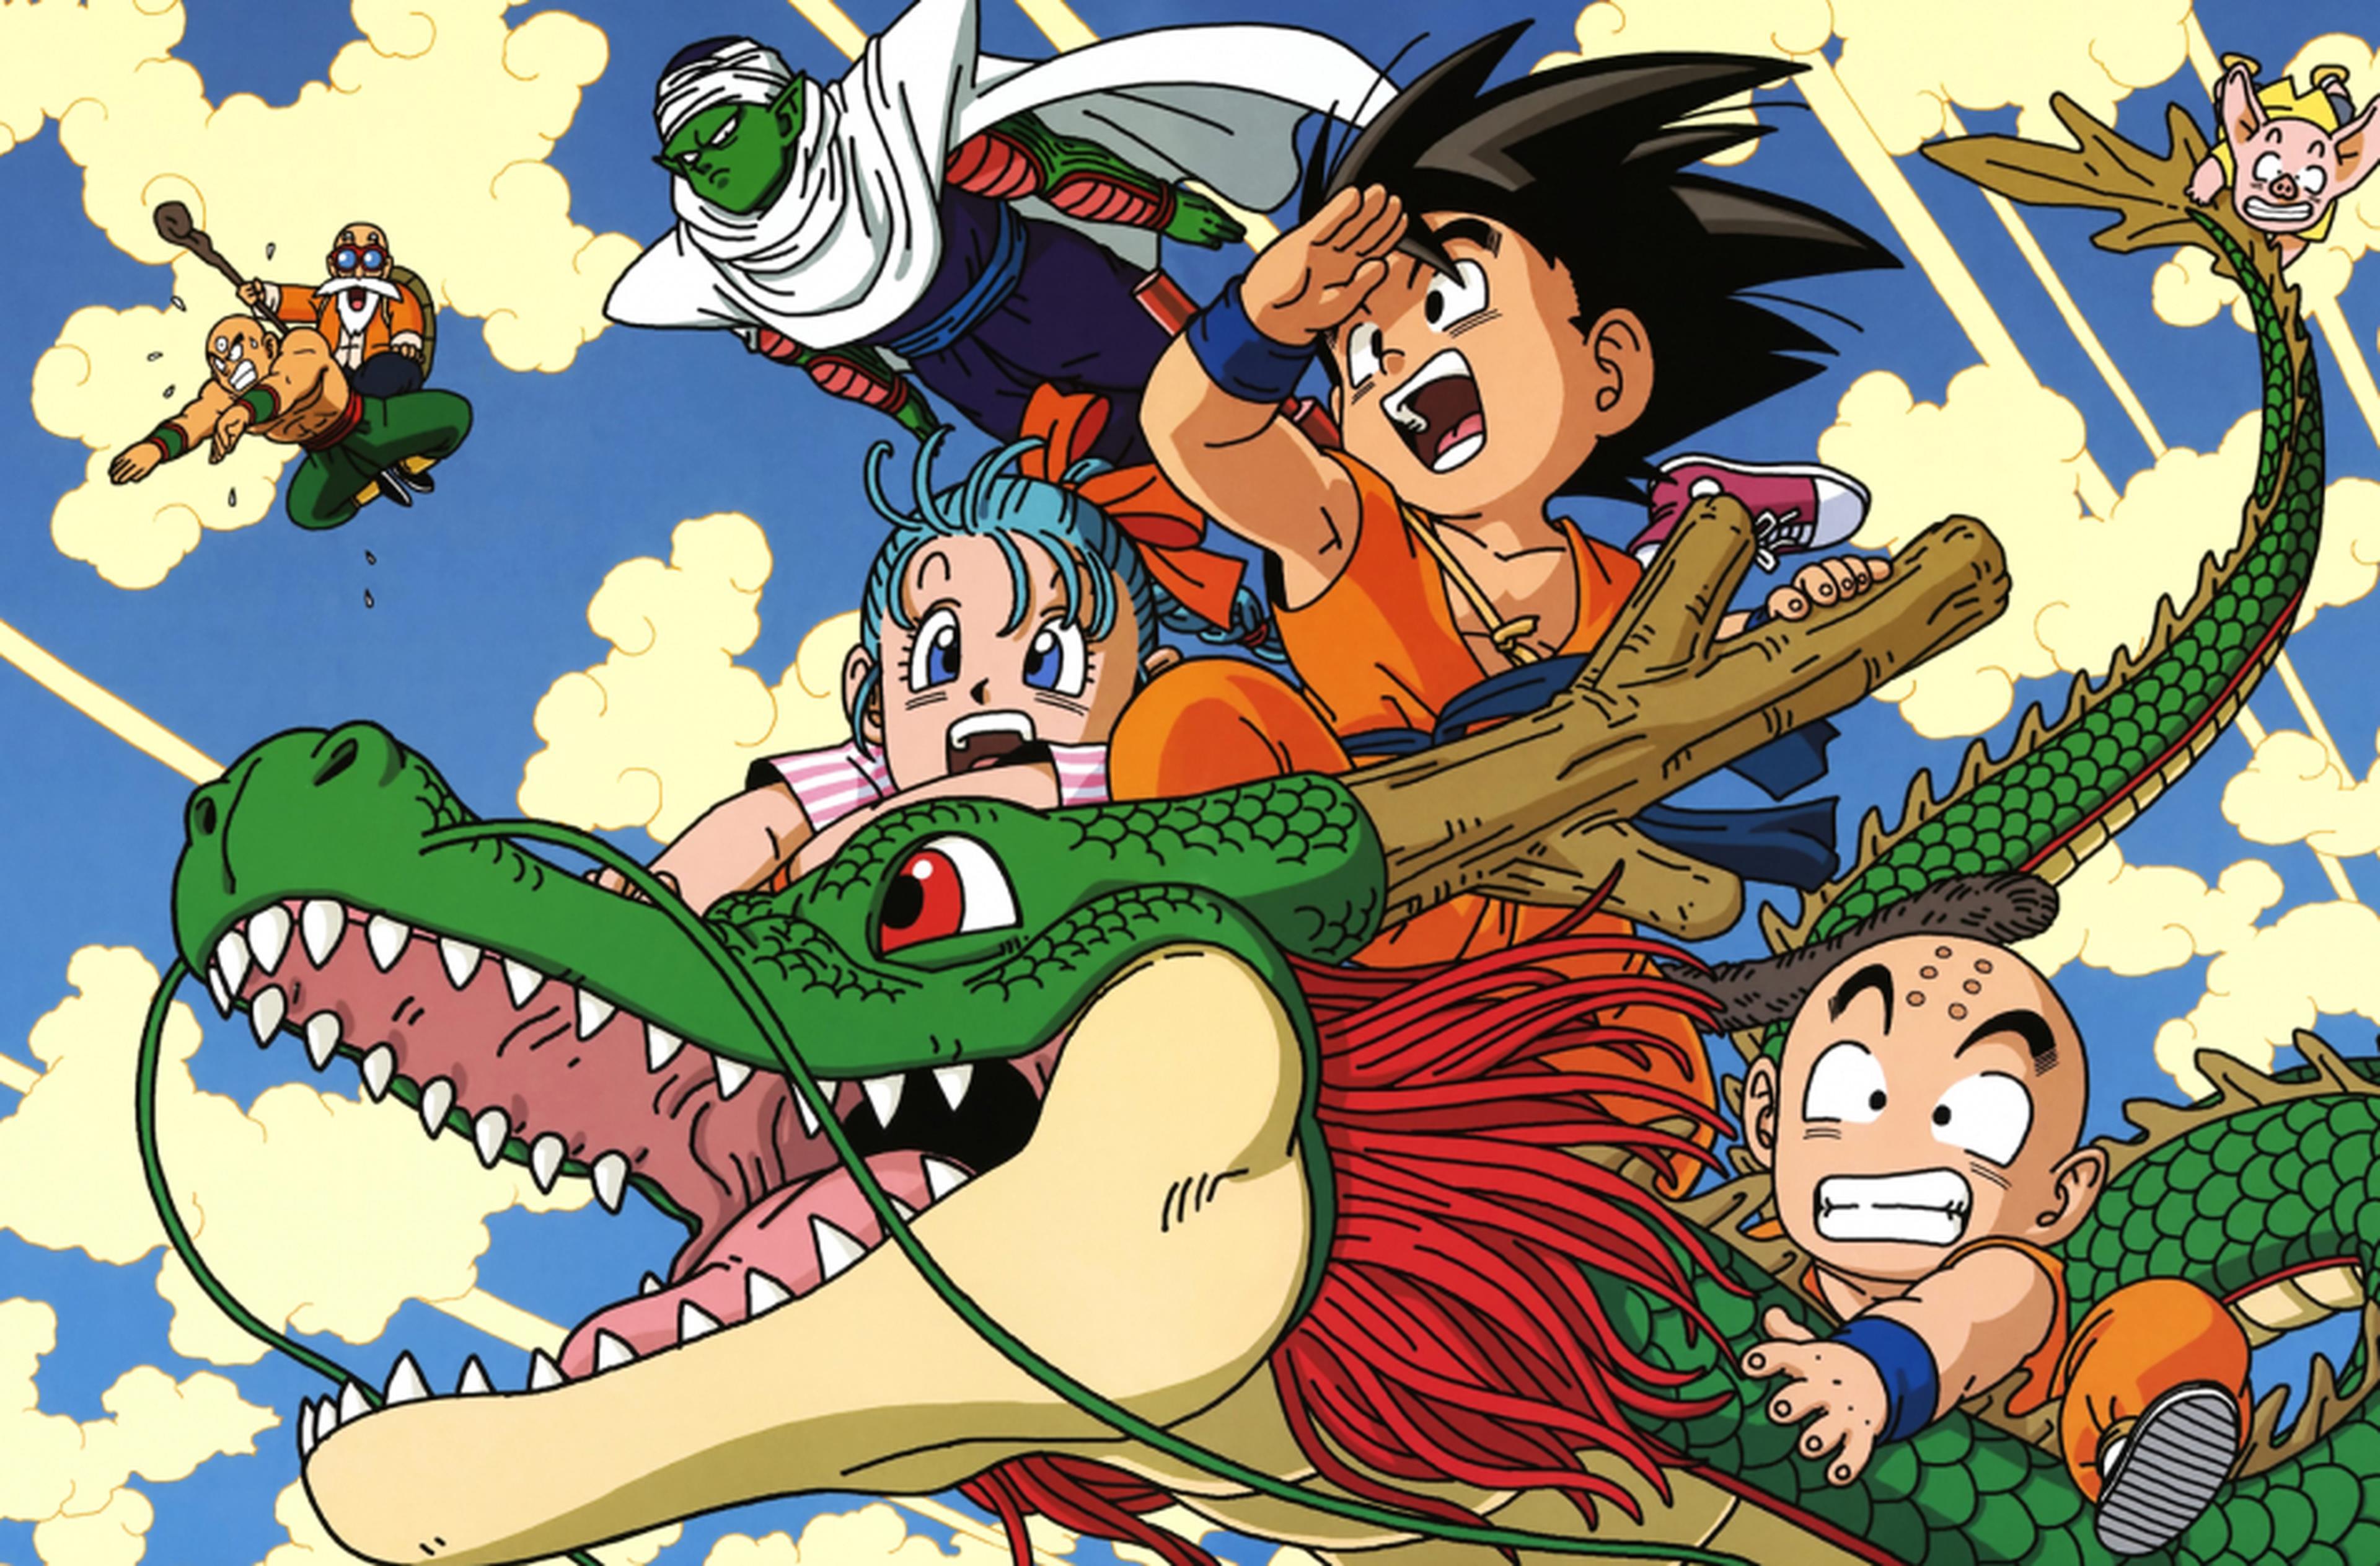 Goku cavalca Shenron in Dragon Ball